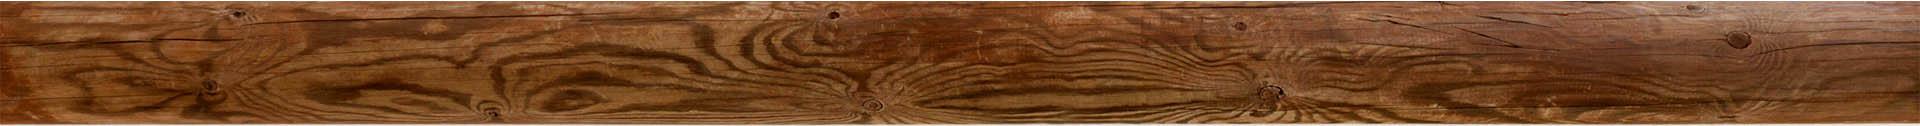 madera-separacion-para-cabecera-oscuro